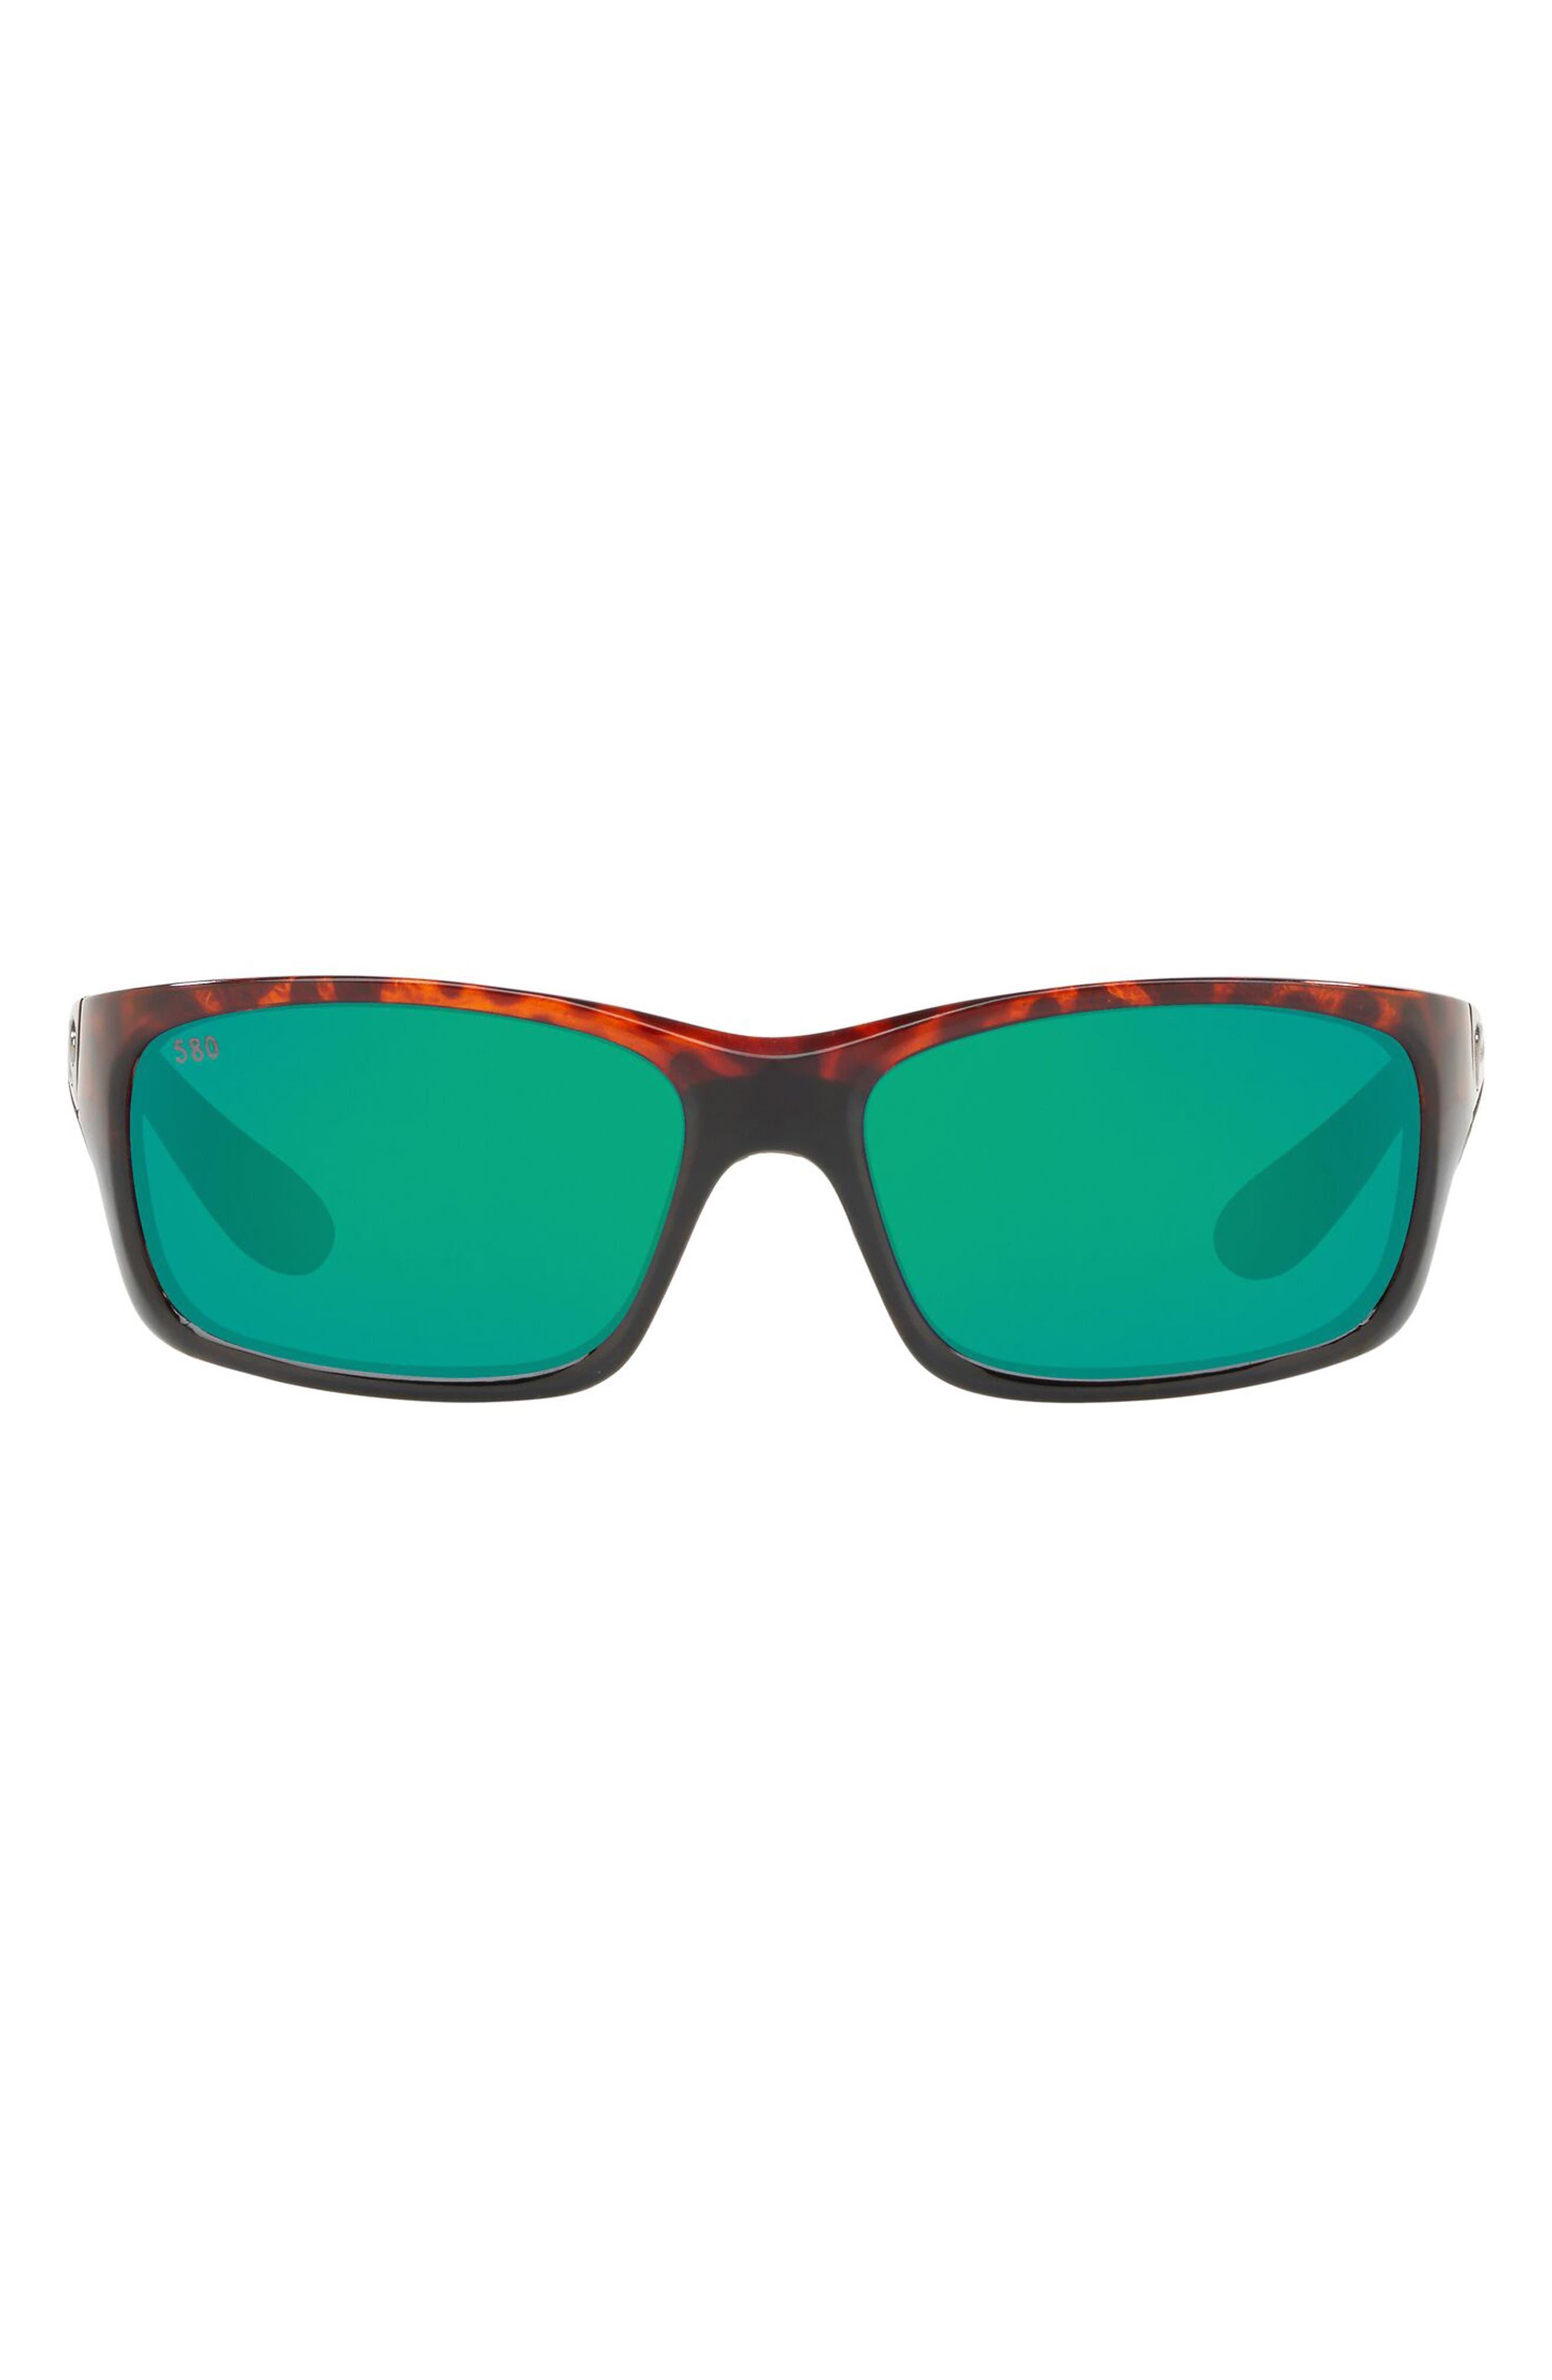 62mm Waypoint Rectangluar Polaraized Sunglasses